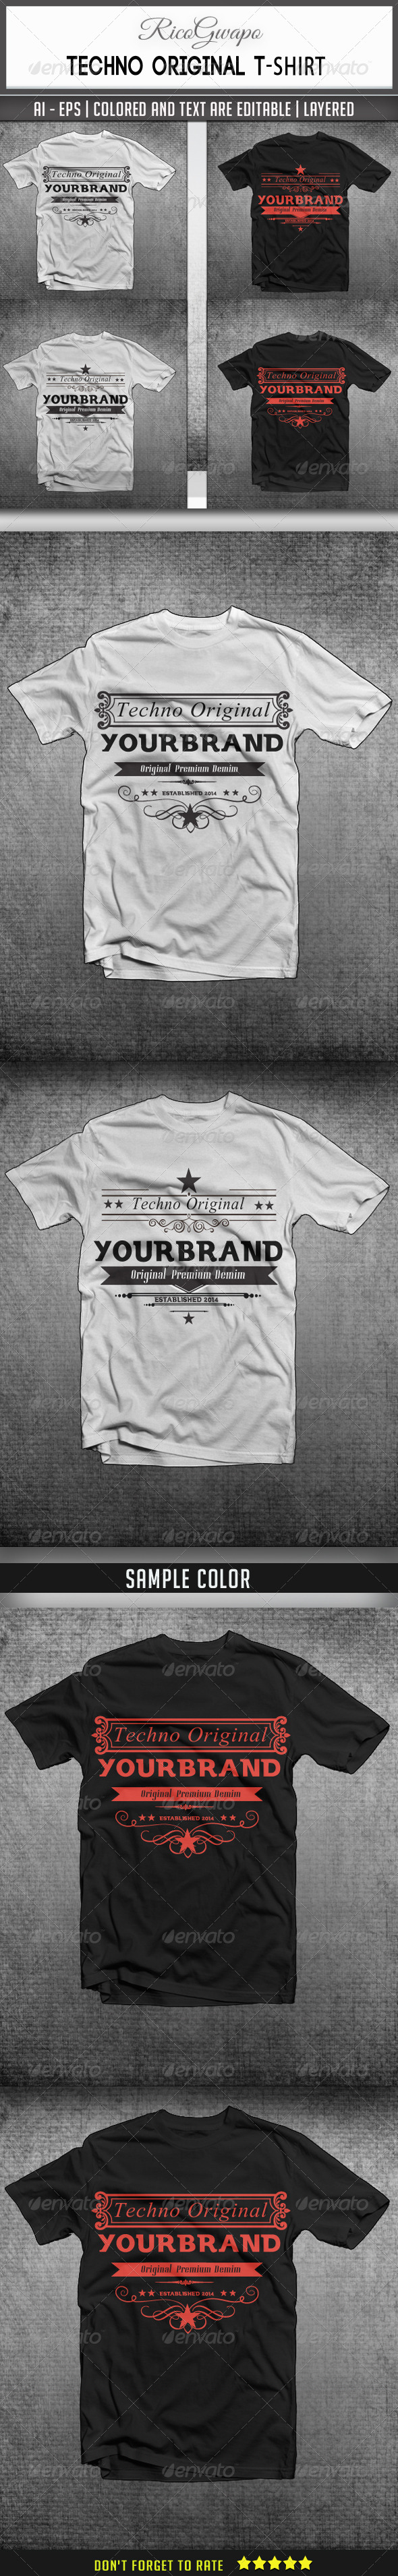 GraphicRiver Techno Original T-Shirts 6912949